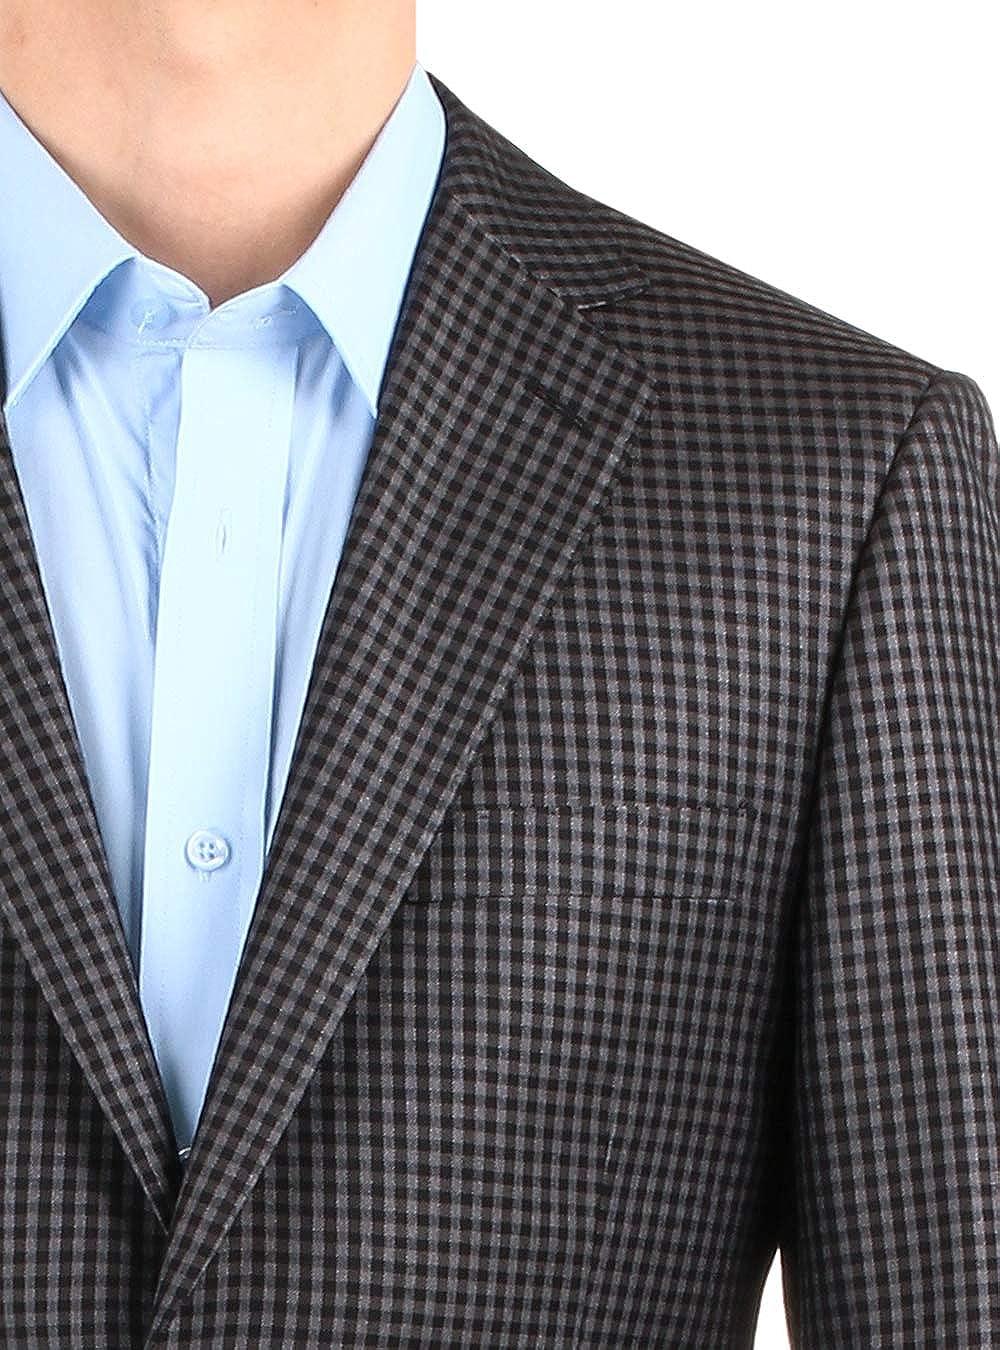 DTI BB Signature Mens Dress Suit Jacket Two Button Check Modern Fit Blazer Coat